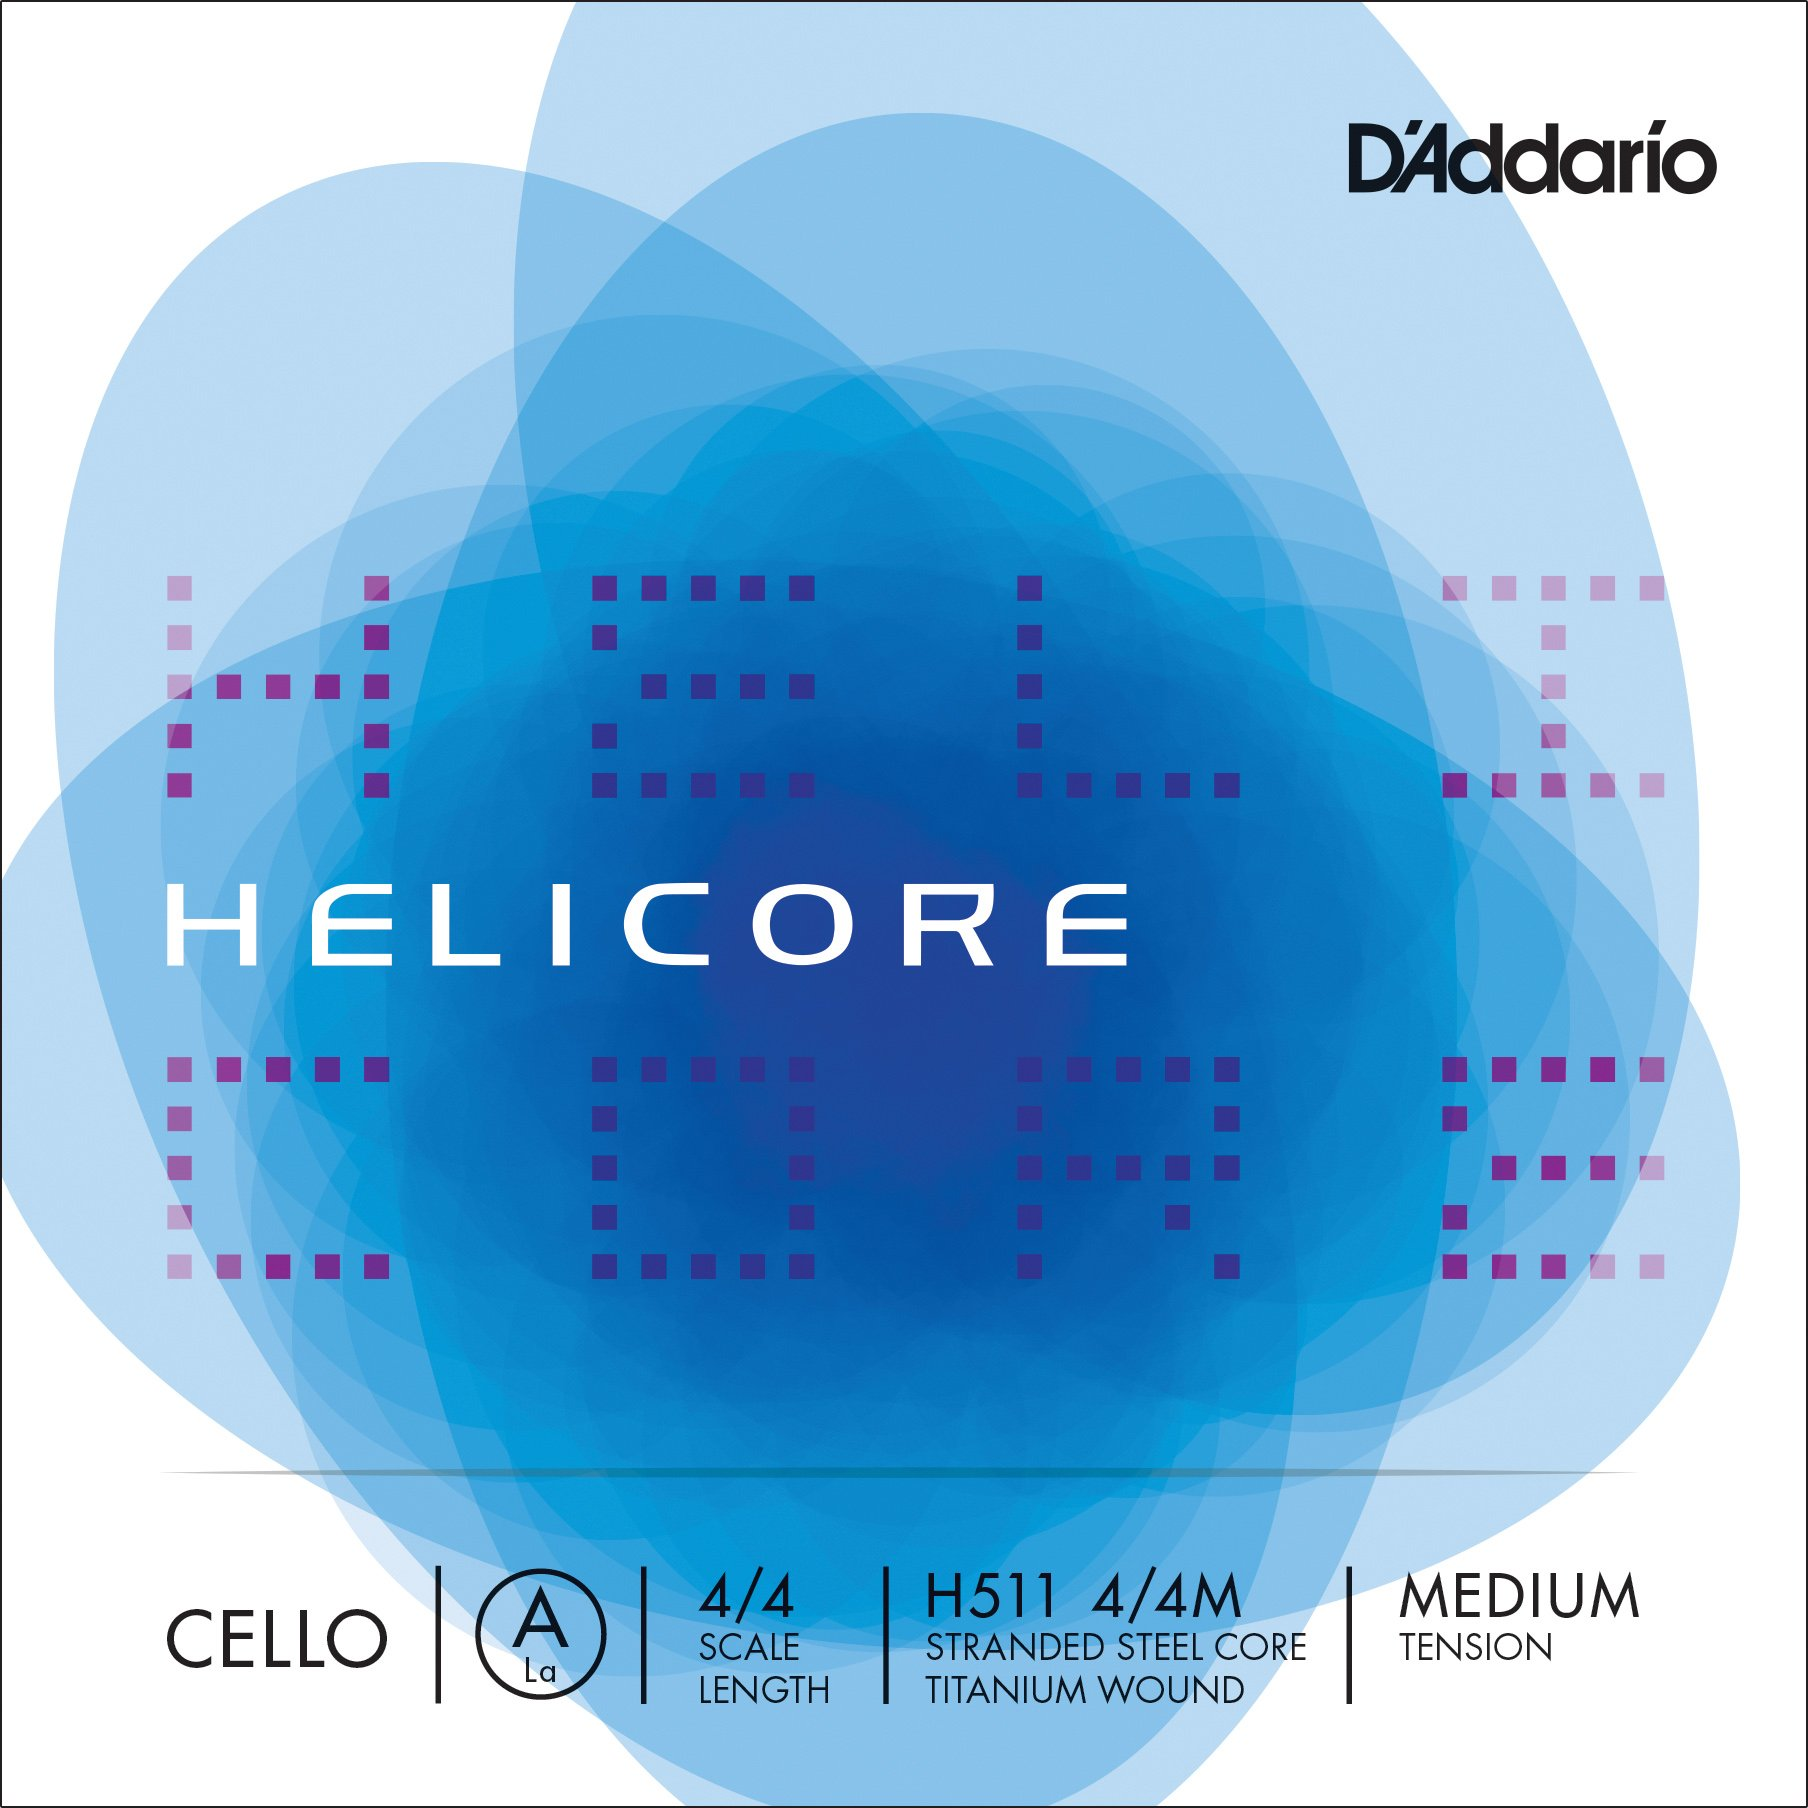 D'Addario Helicore Cello Single A String, 4/4 Scale, Medium Tension